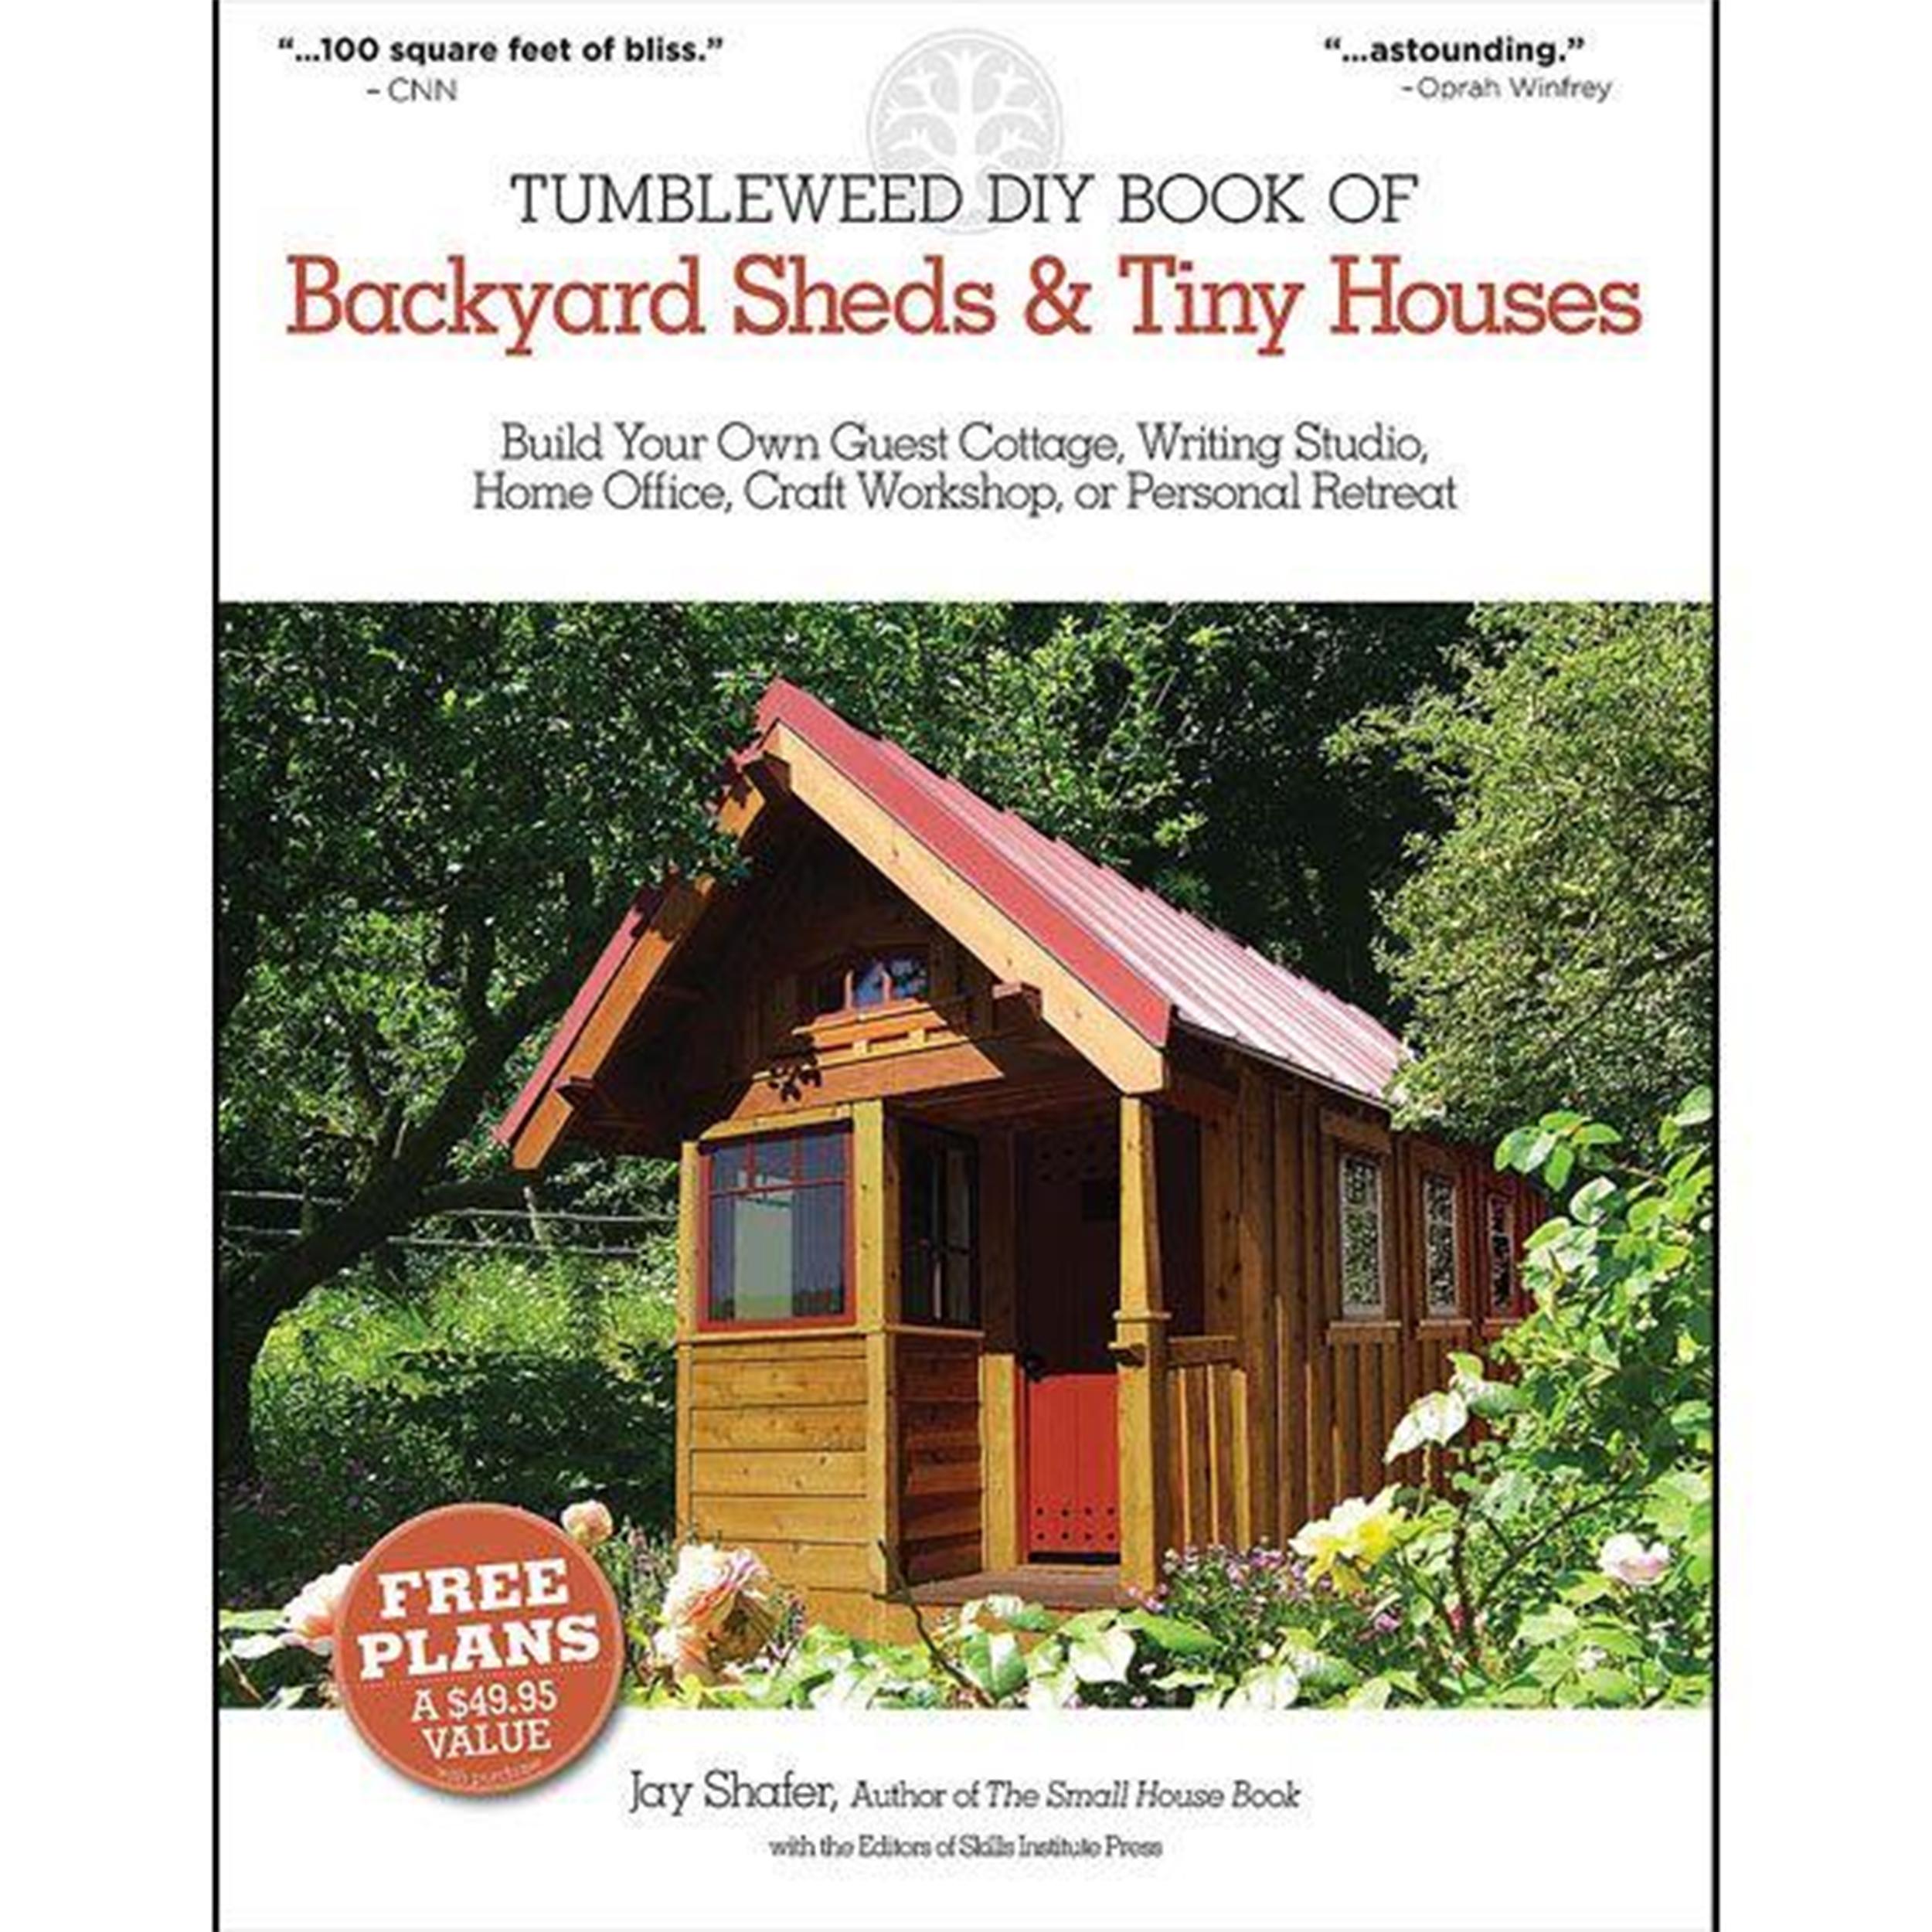 Tumbleweed DIY Book of Backyard Sheds and Tiny Houses